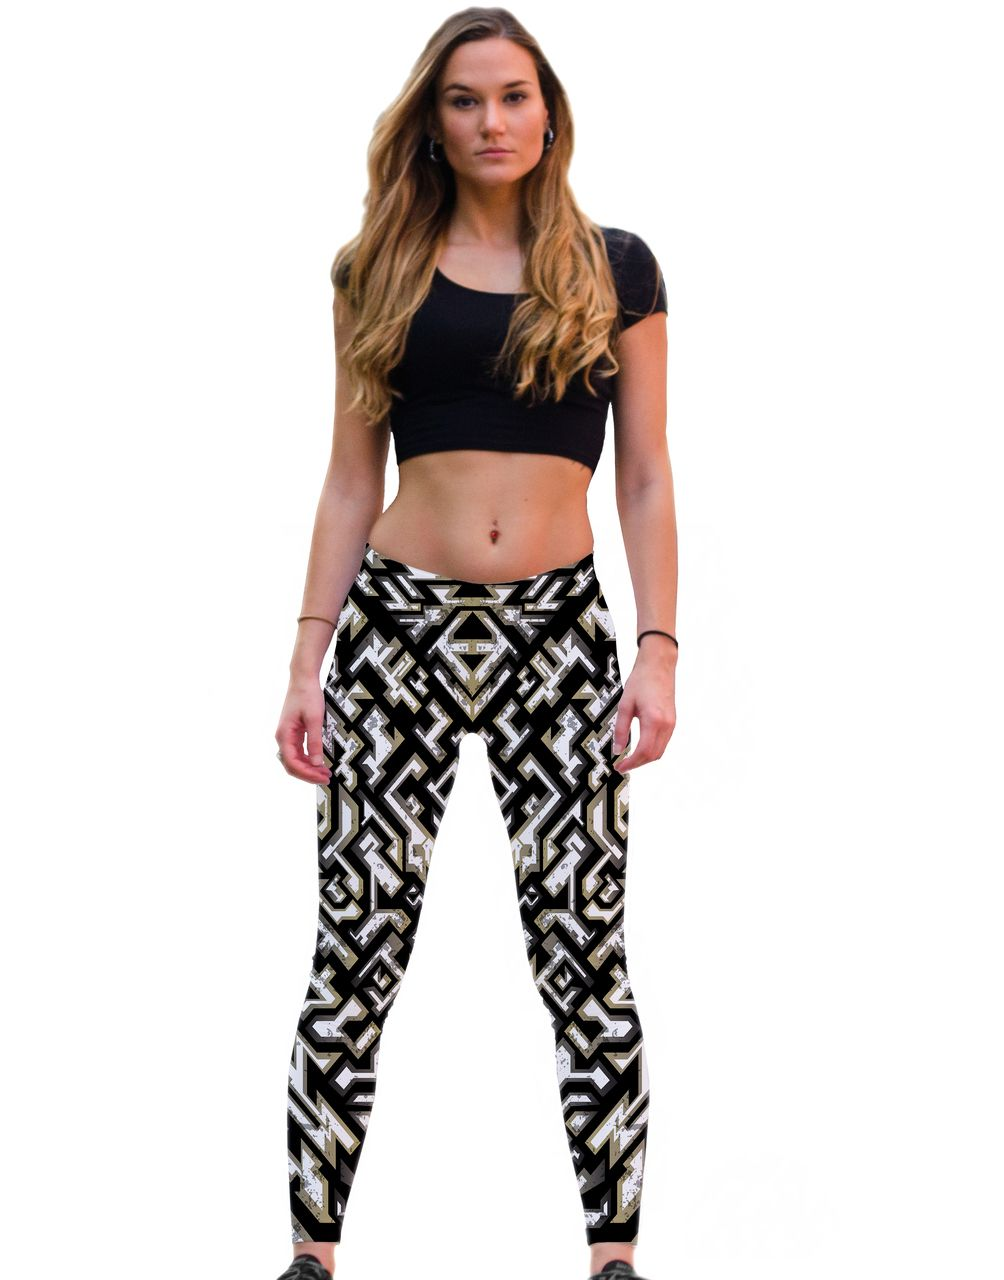 d412becd038d7 Tesseract Yoga Pants - Sum Total Clothing | Women's Fashion | Pants ...